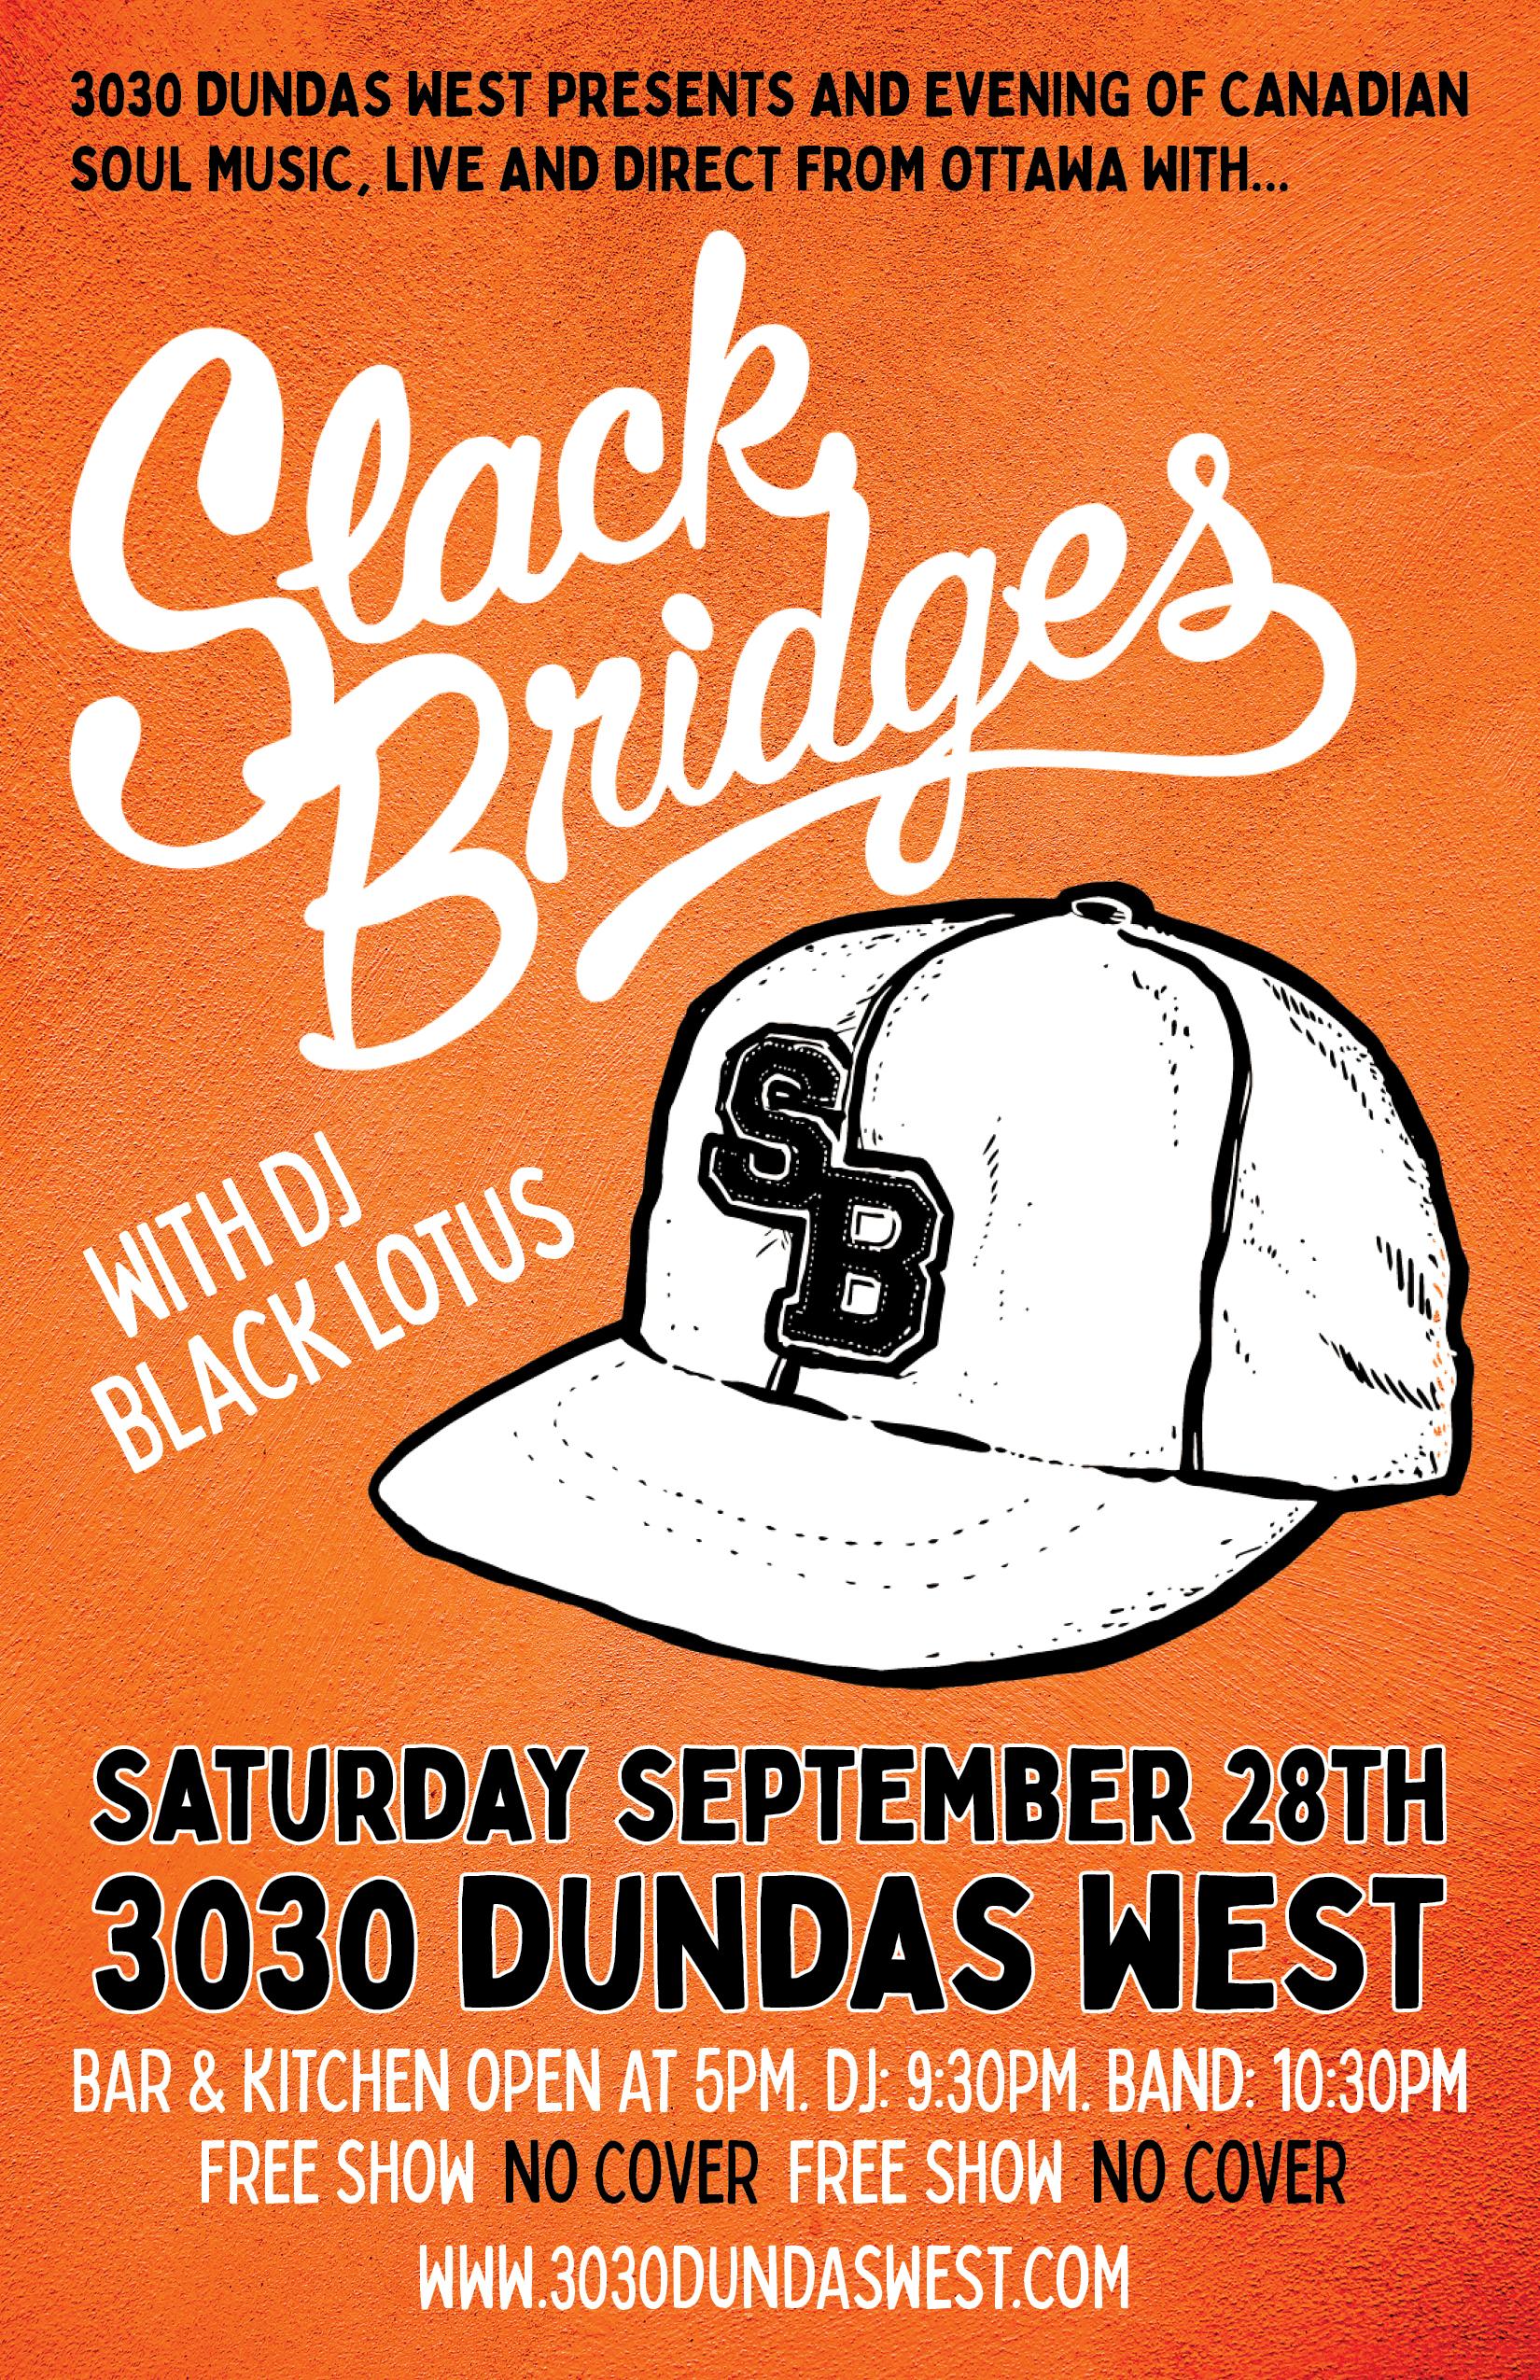 slack_bridges_3030_september_facebook.jpg